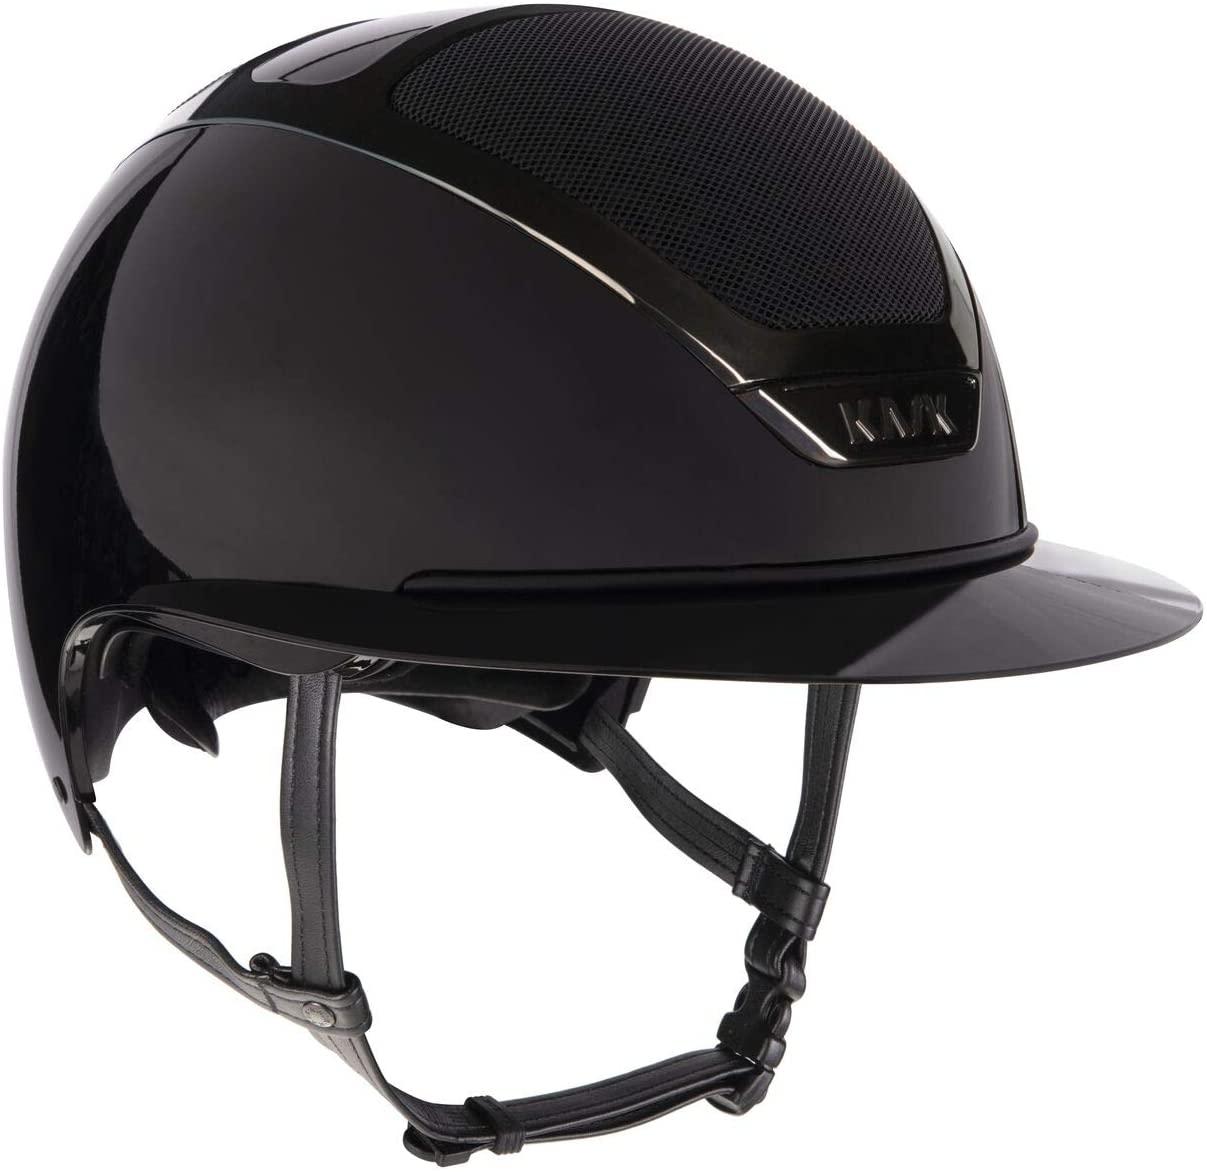 Kask Equestrian Helmet Dogma Star Lady Pure Shine Chrome Wide Brim Helmet with Detachable Cushioned Brace